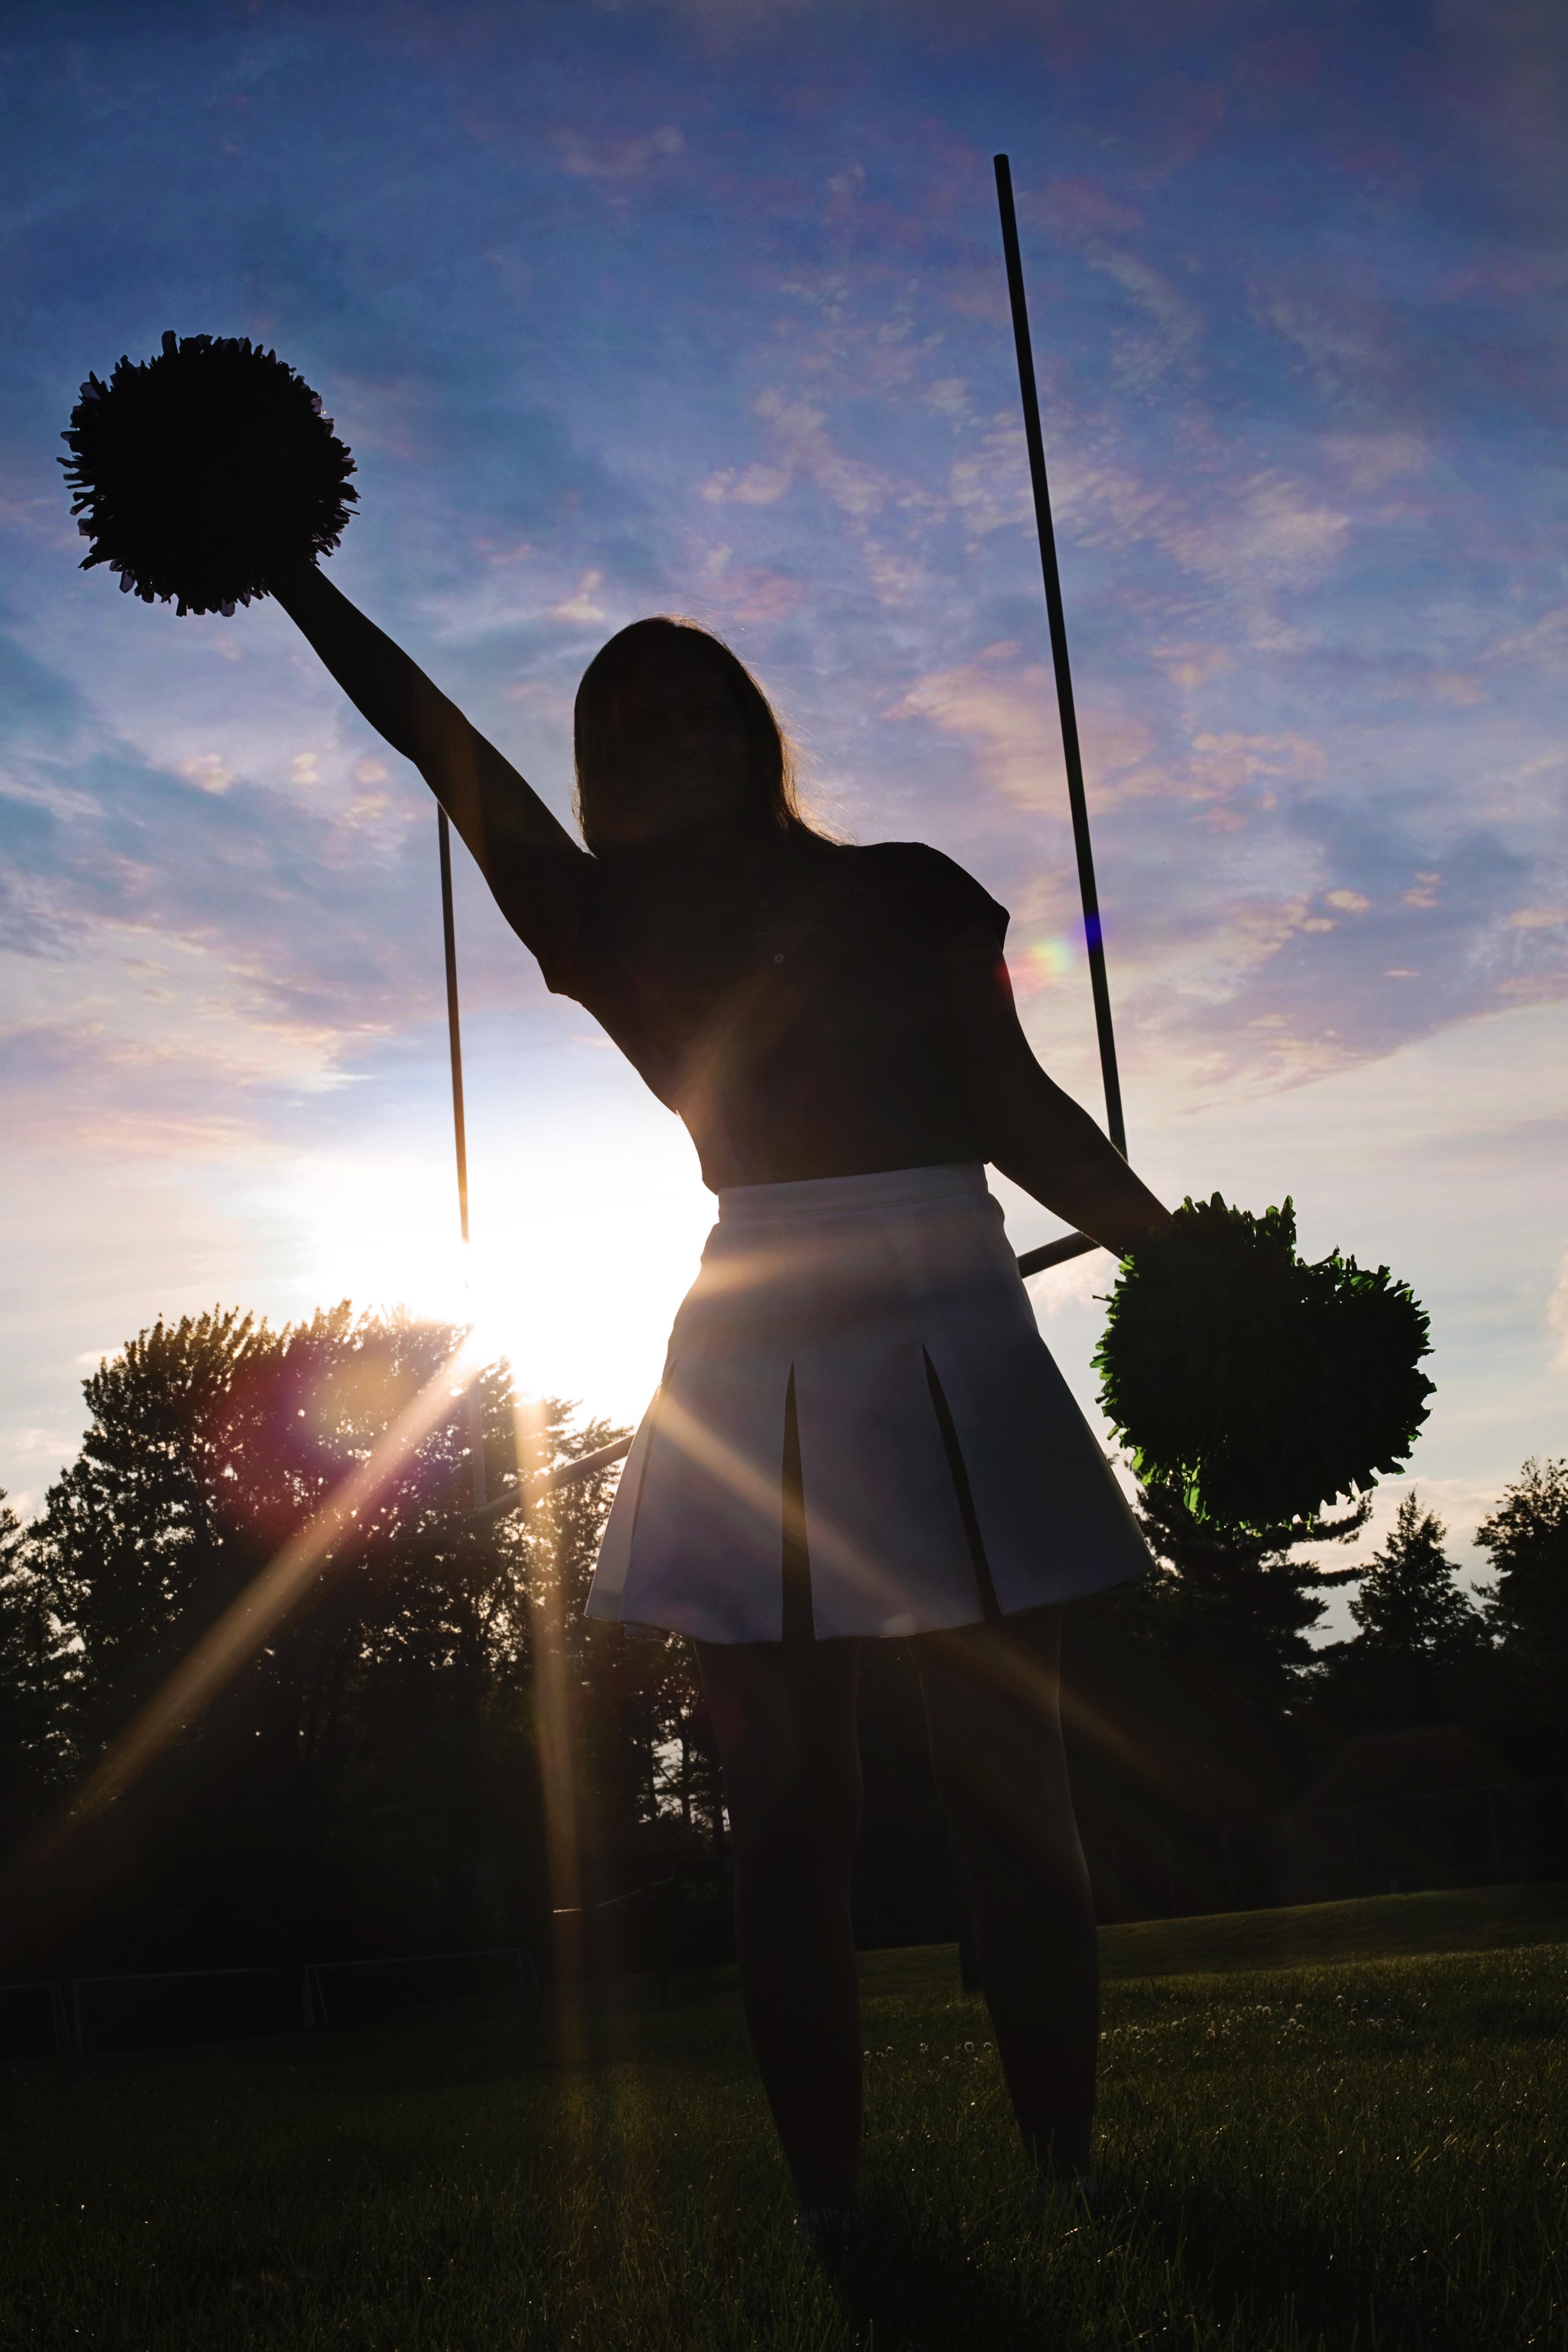 Cheerleader practicing photo